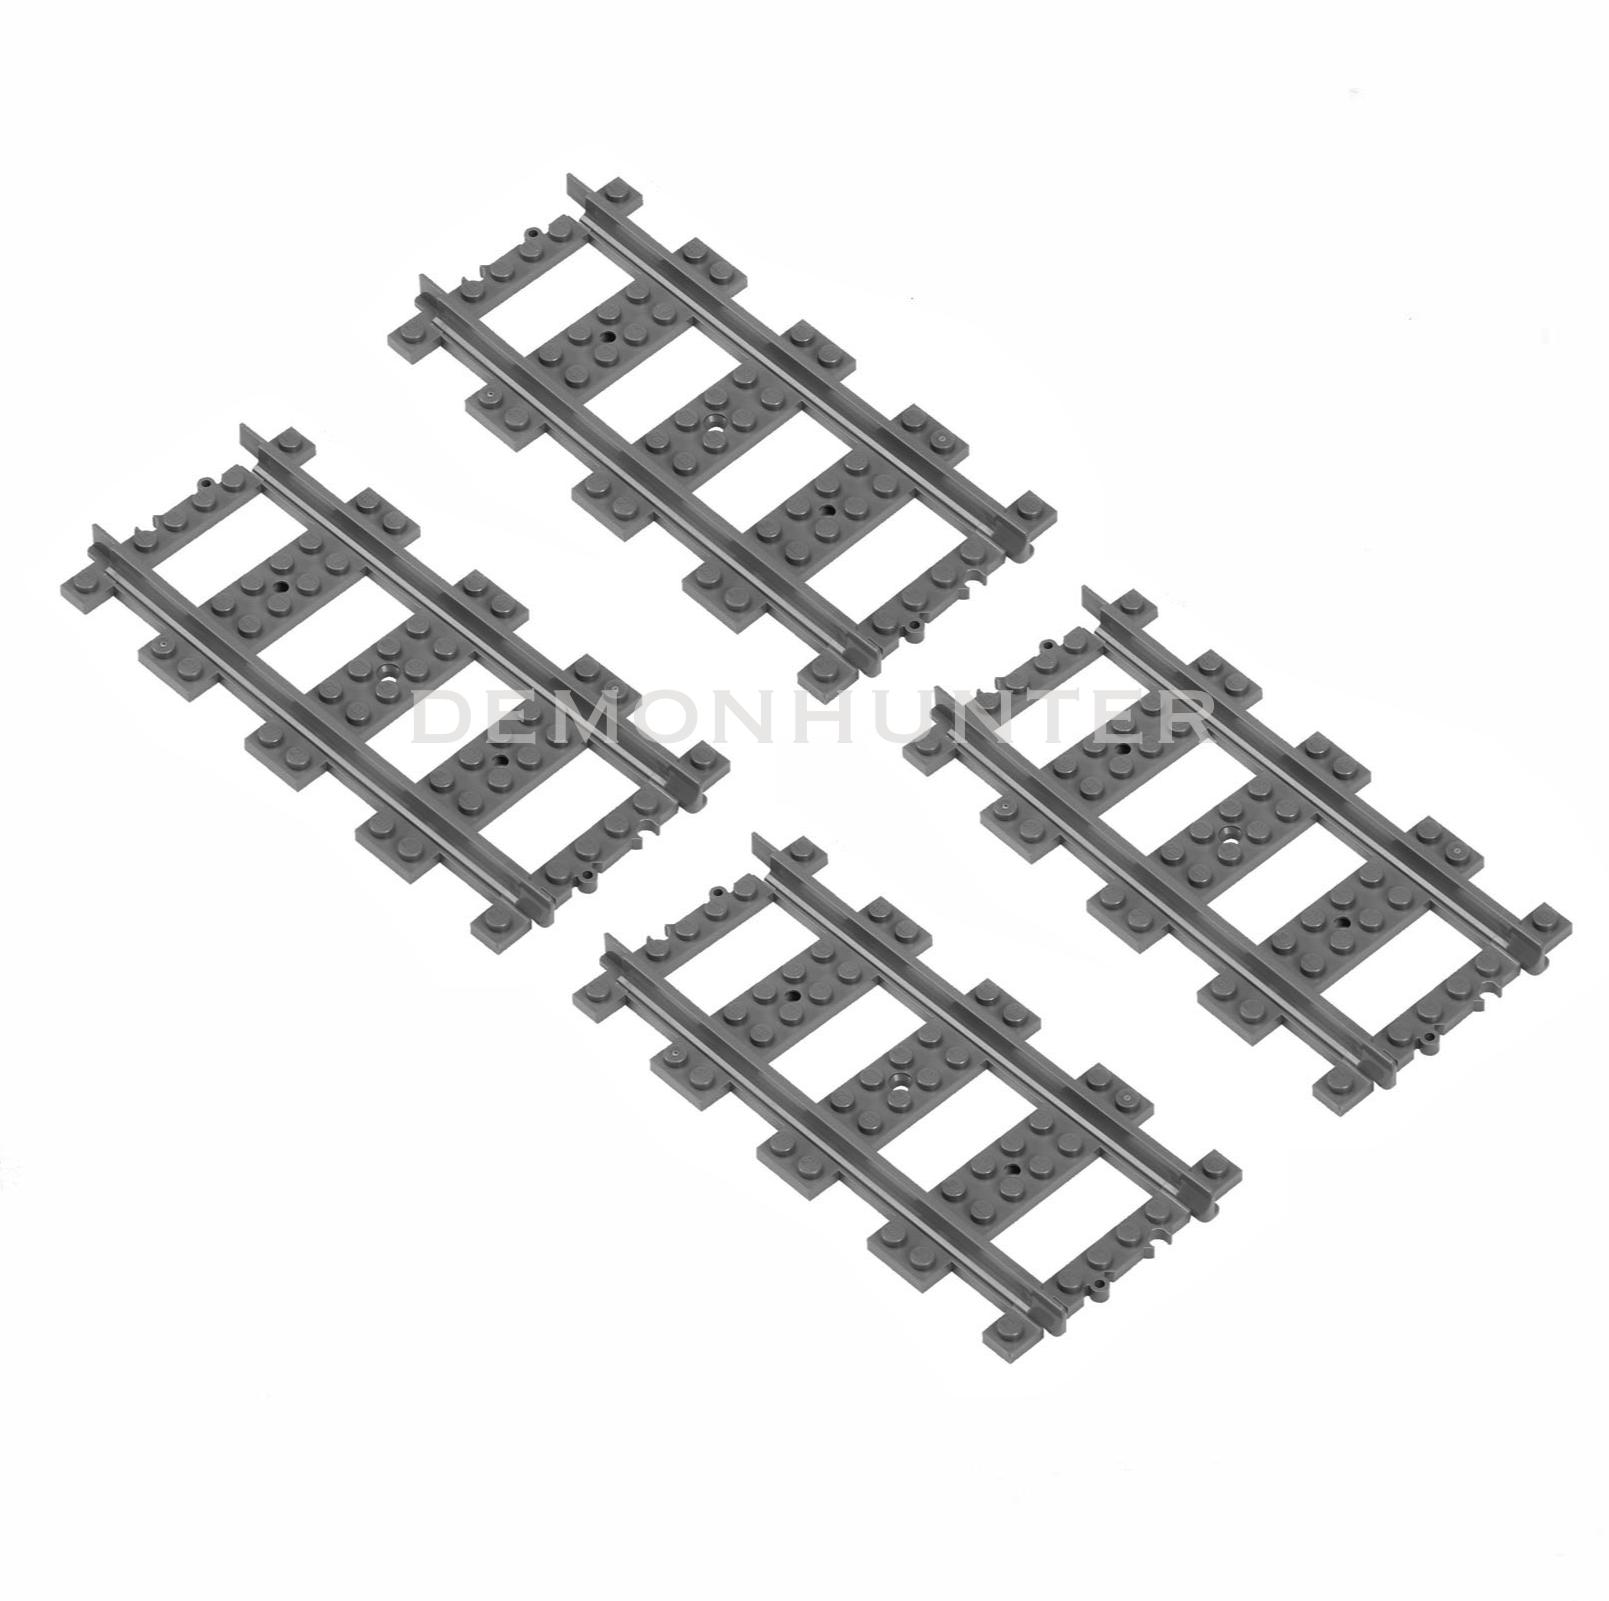 Lego Straight track